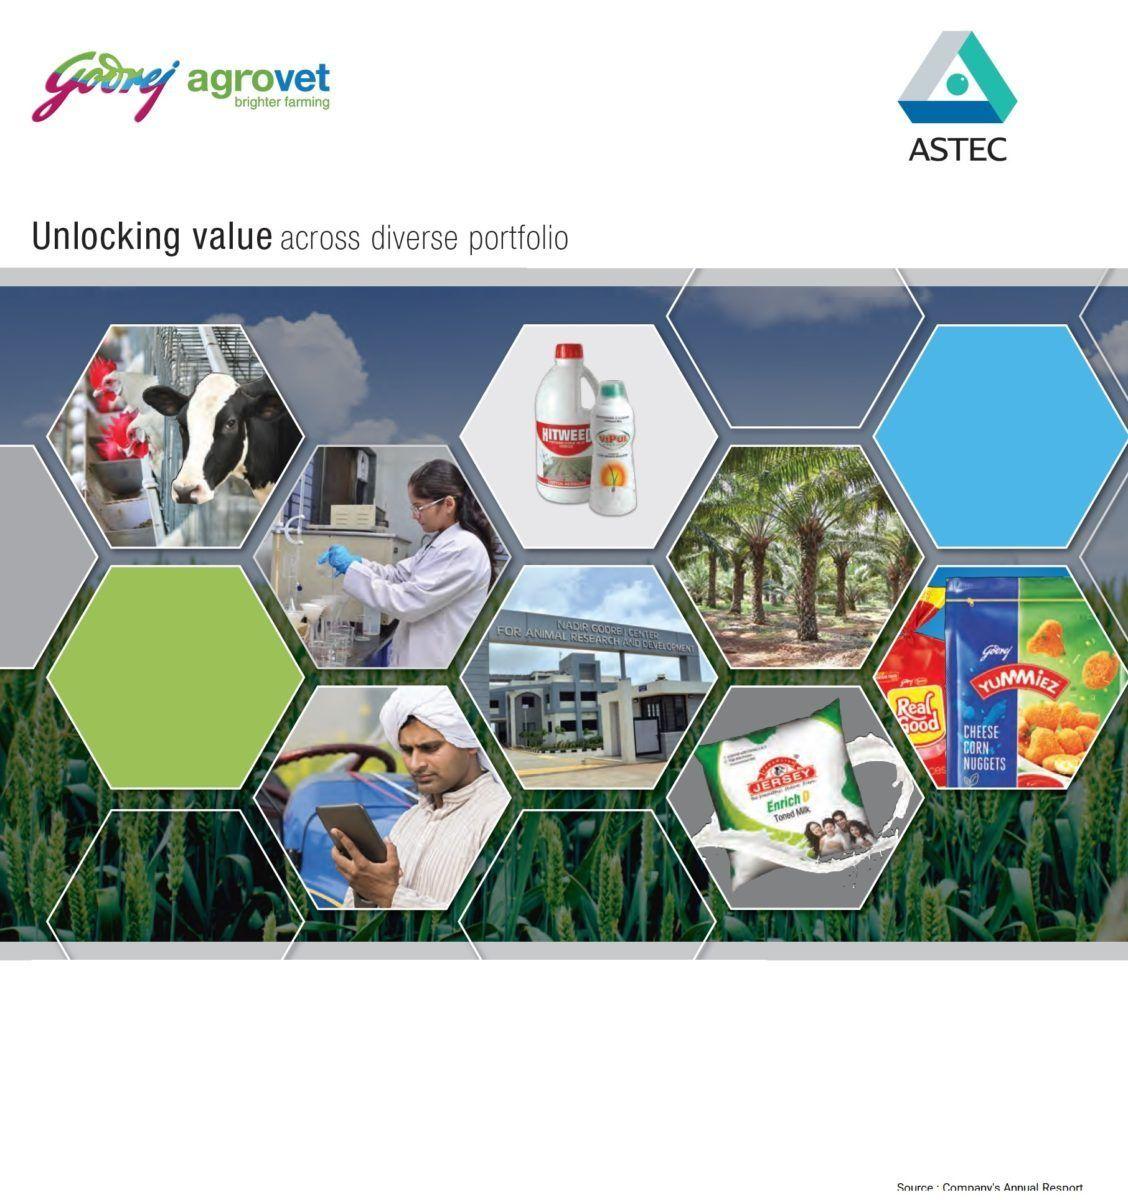 Merger Godrej Agrovet Astec Agrichemical Merger Holding Company Chemical